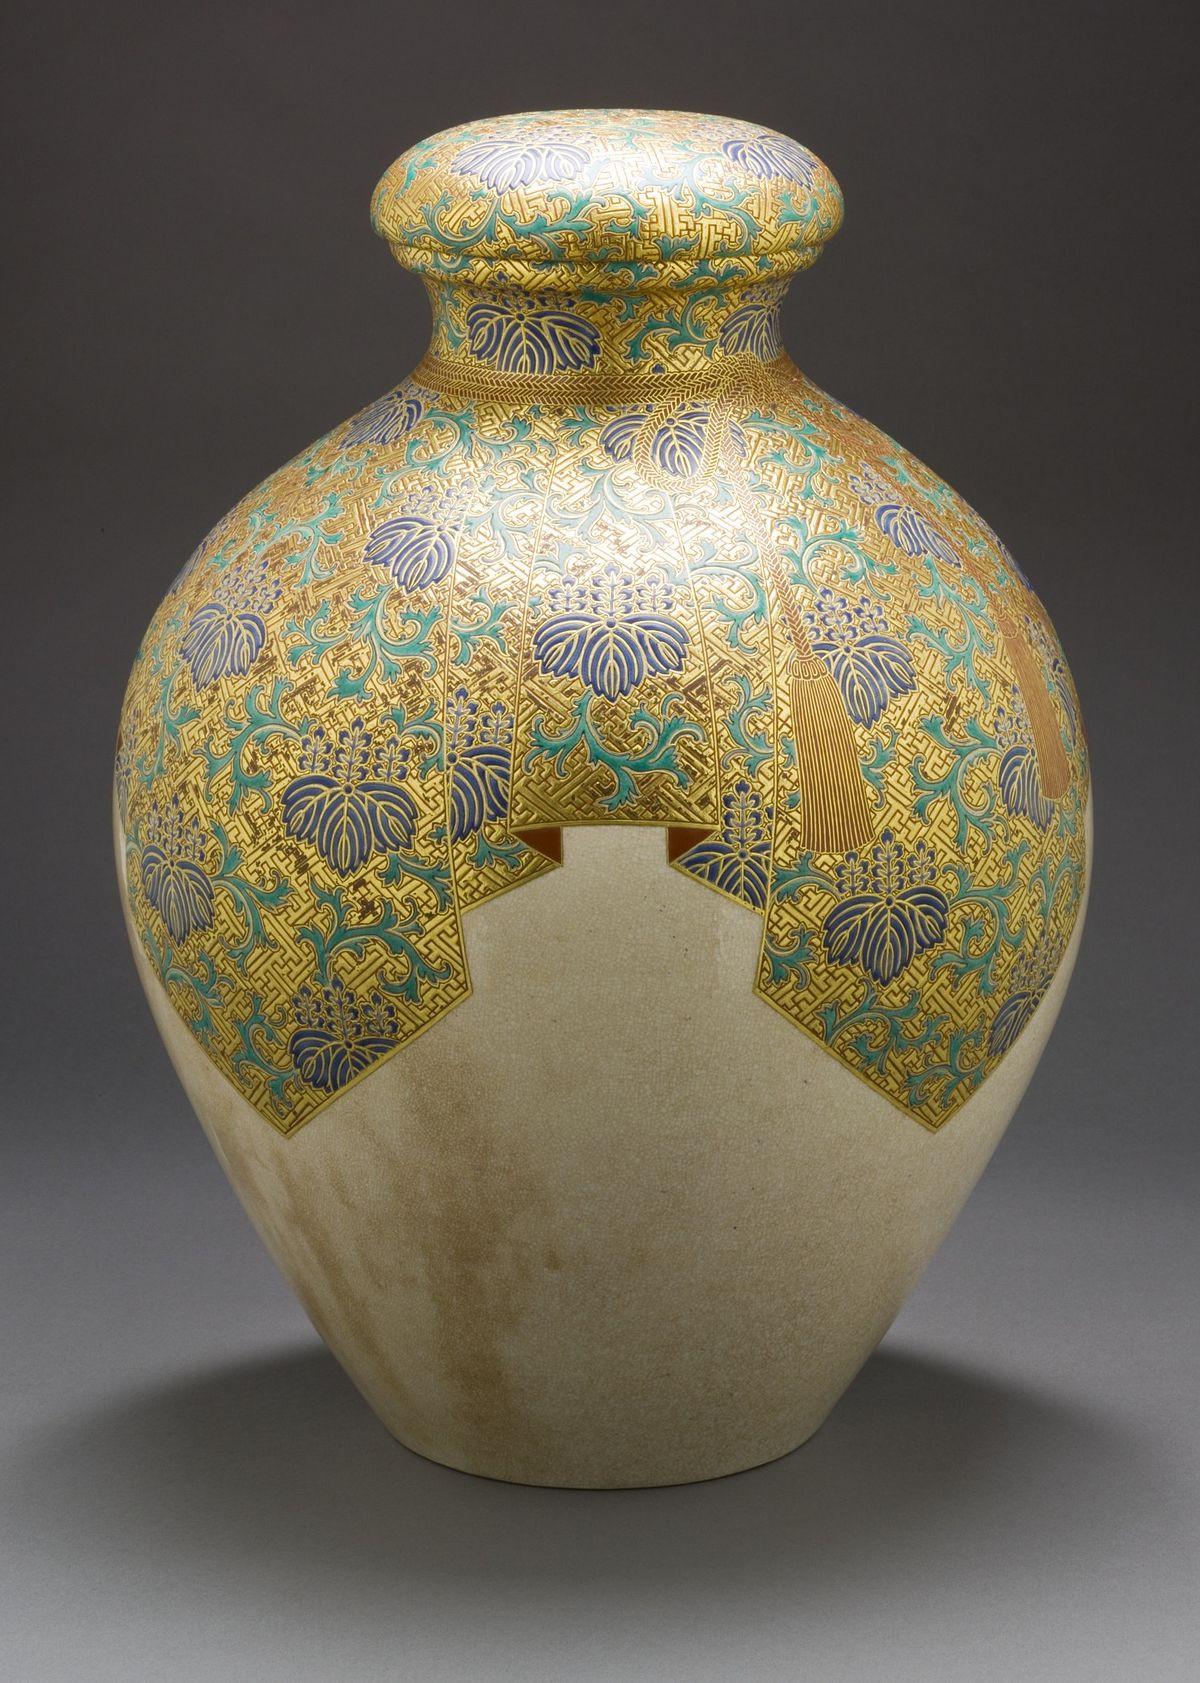 oriental vase appraisal of satsuma ware wikipedia with 1200px tea storage jar with paulownia and thunder pattern lacma m 2007 130a b